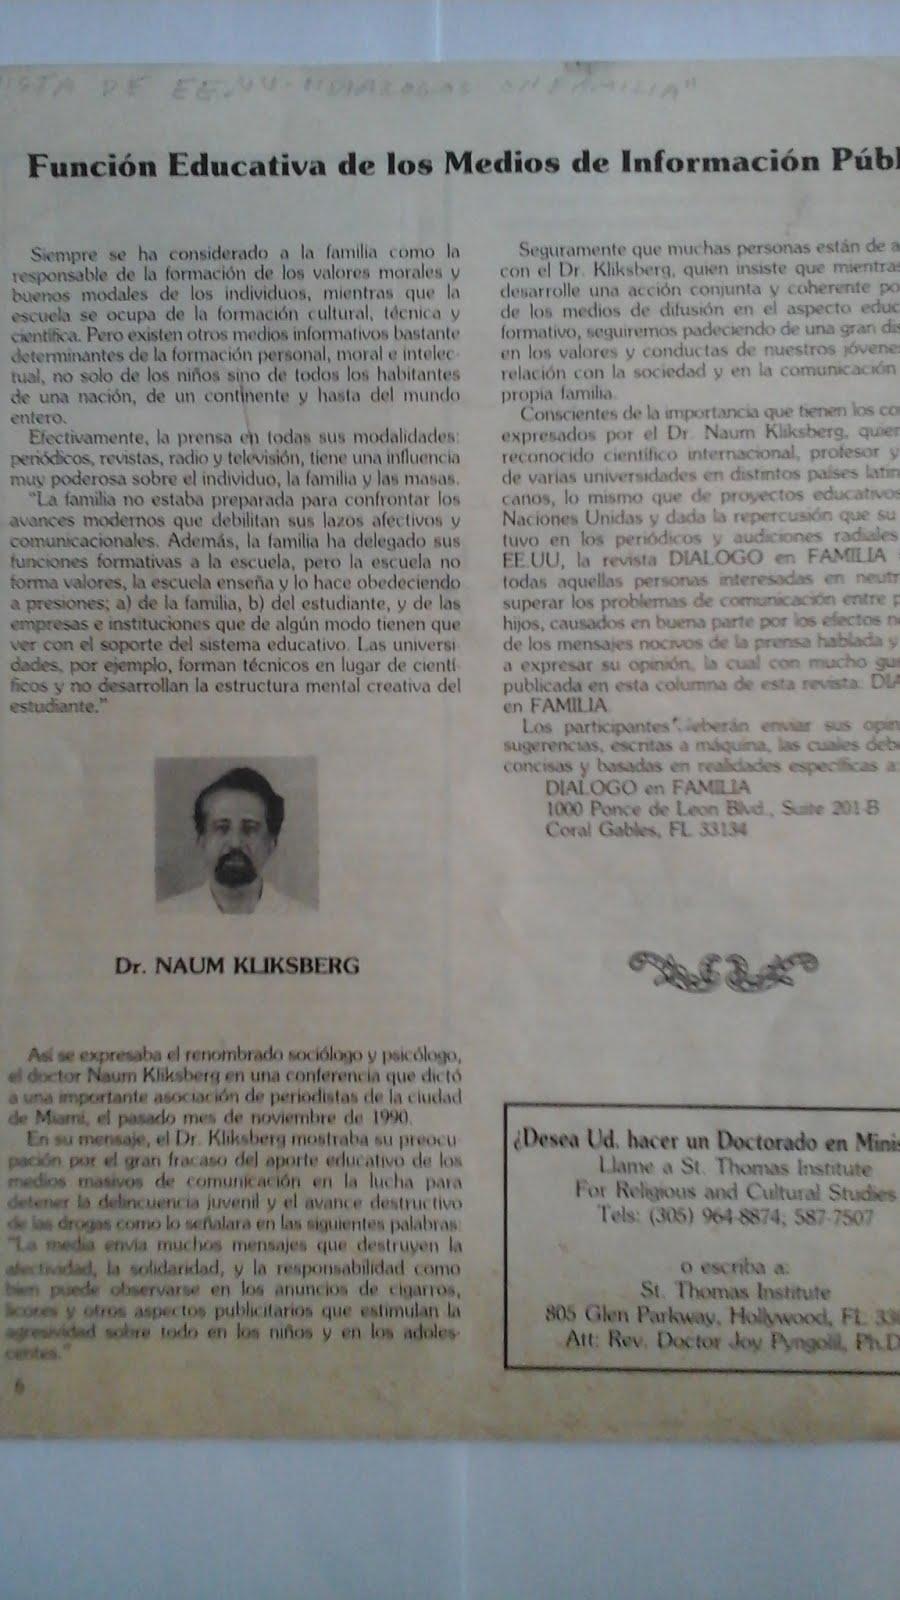 64 - REVISTA DIÁLOGOS EN FAMILIA, MIAMI, EEUU,2/1997. REPORTAJE A